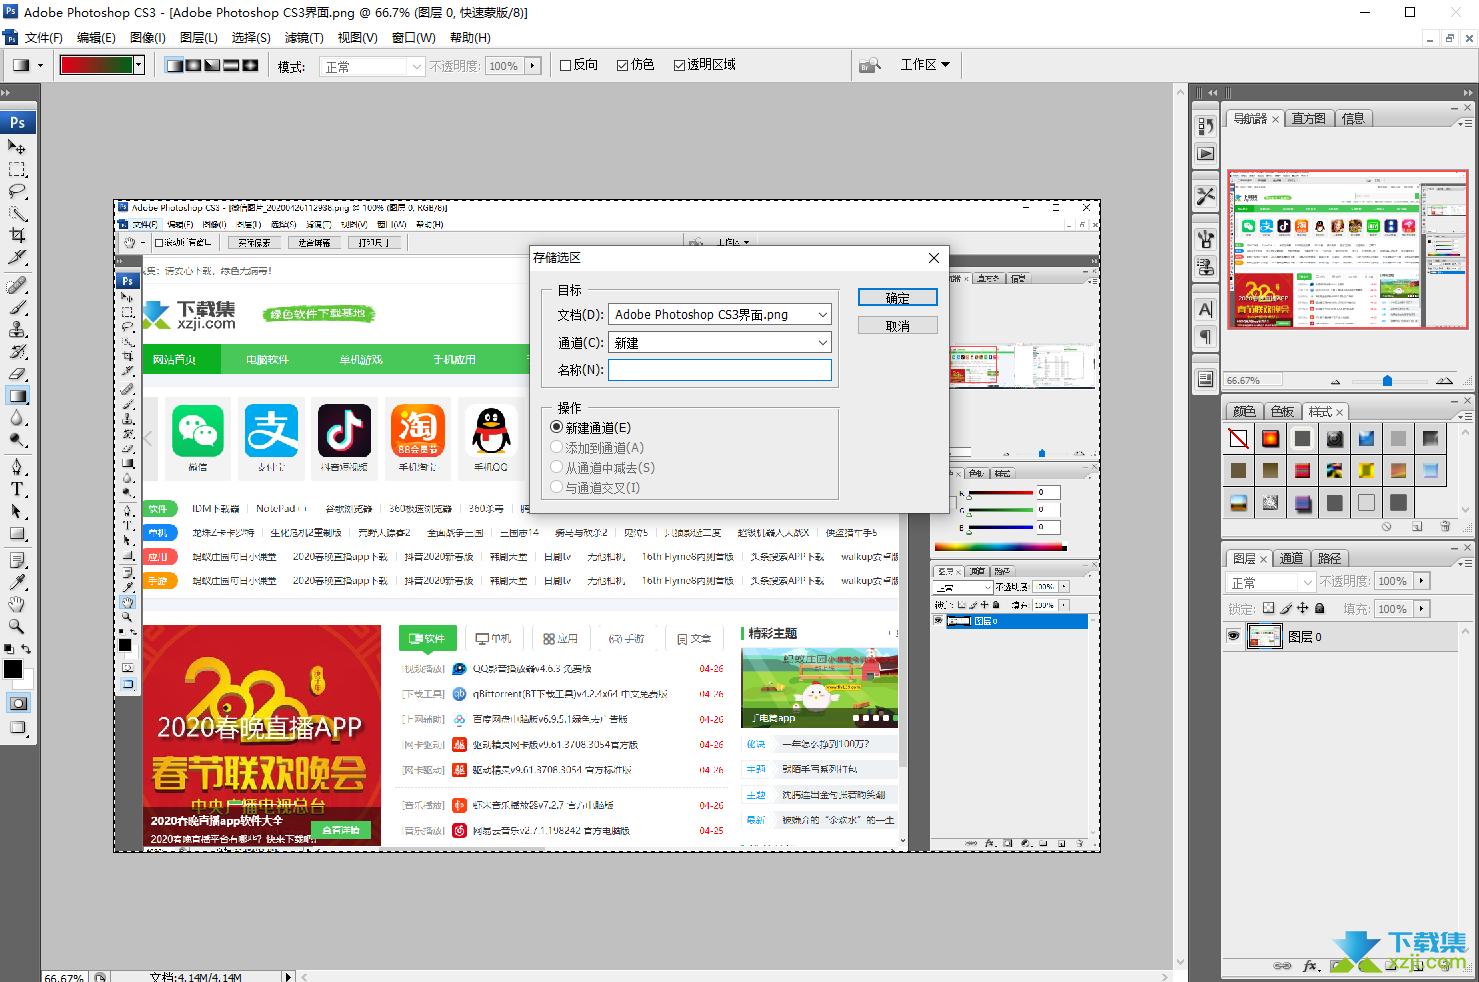 Adobe Photoshop CS3界面1